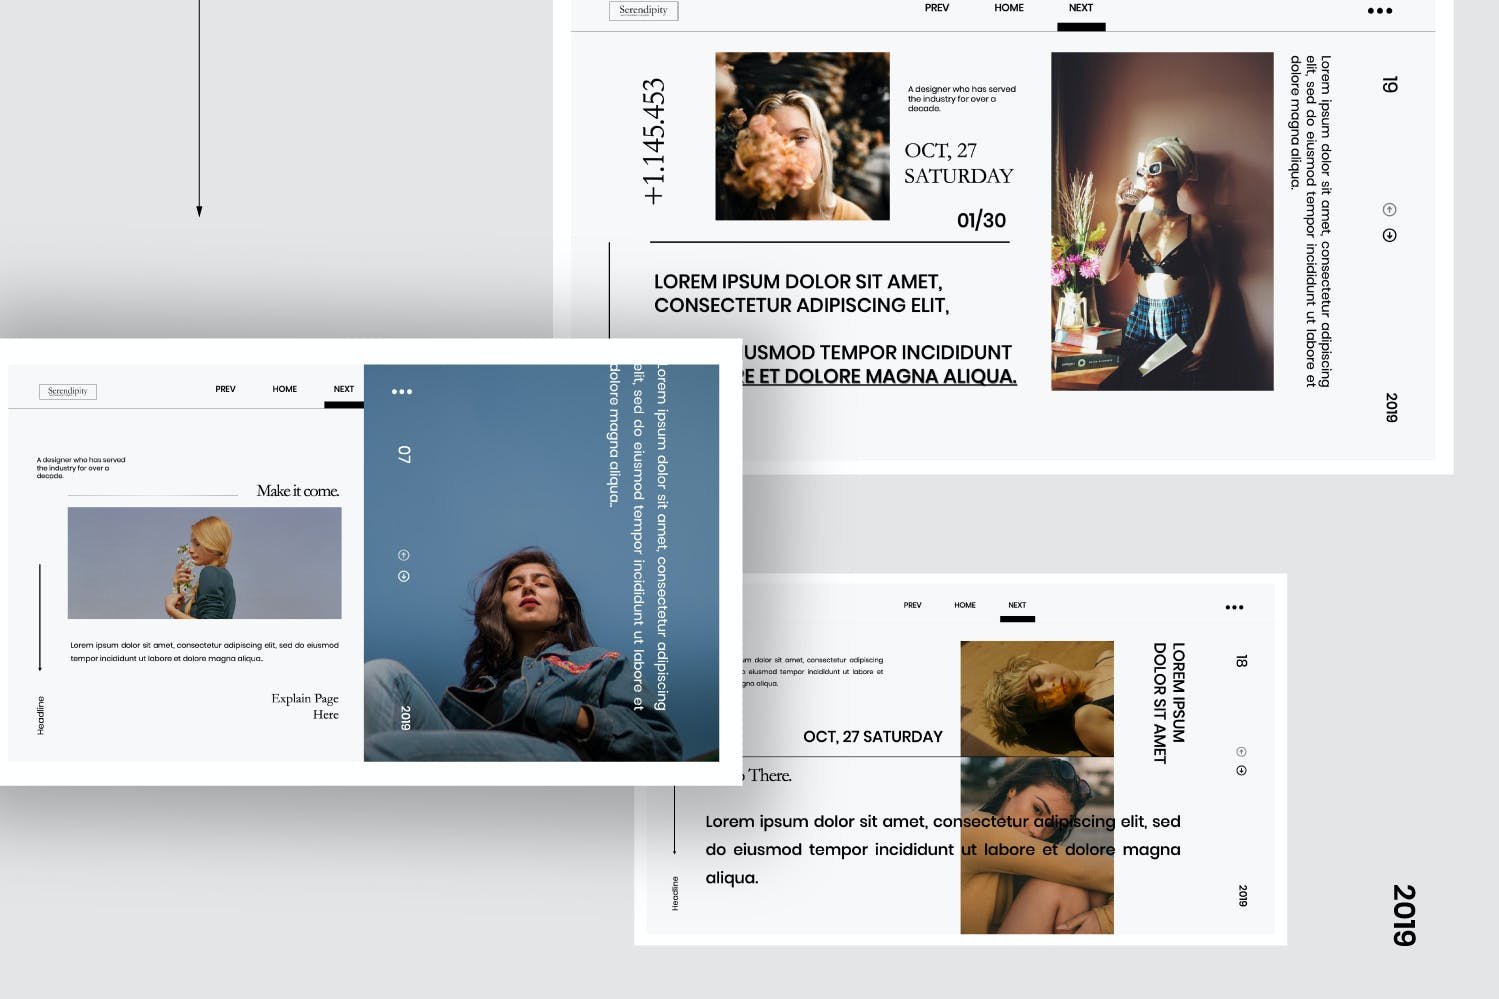 时尚简约服装摄影作品集幻灯片设计模板 Serendipity – Modern Fashion Design Powerpoint插图(3)